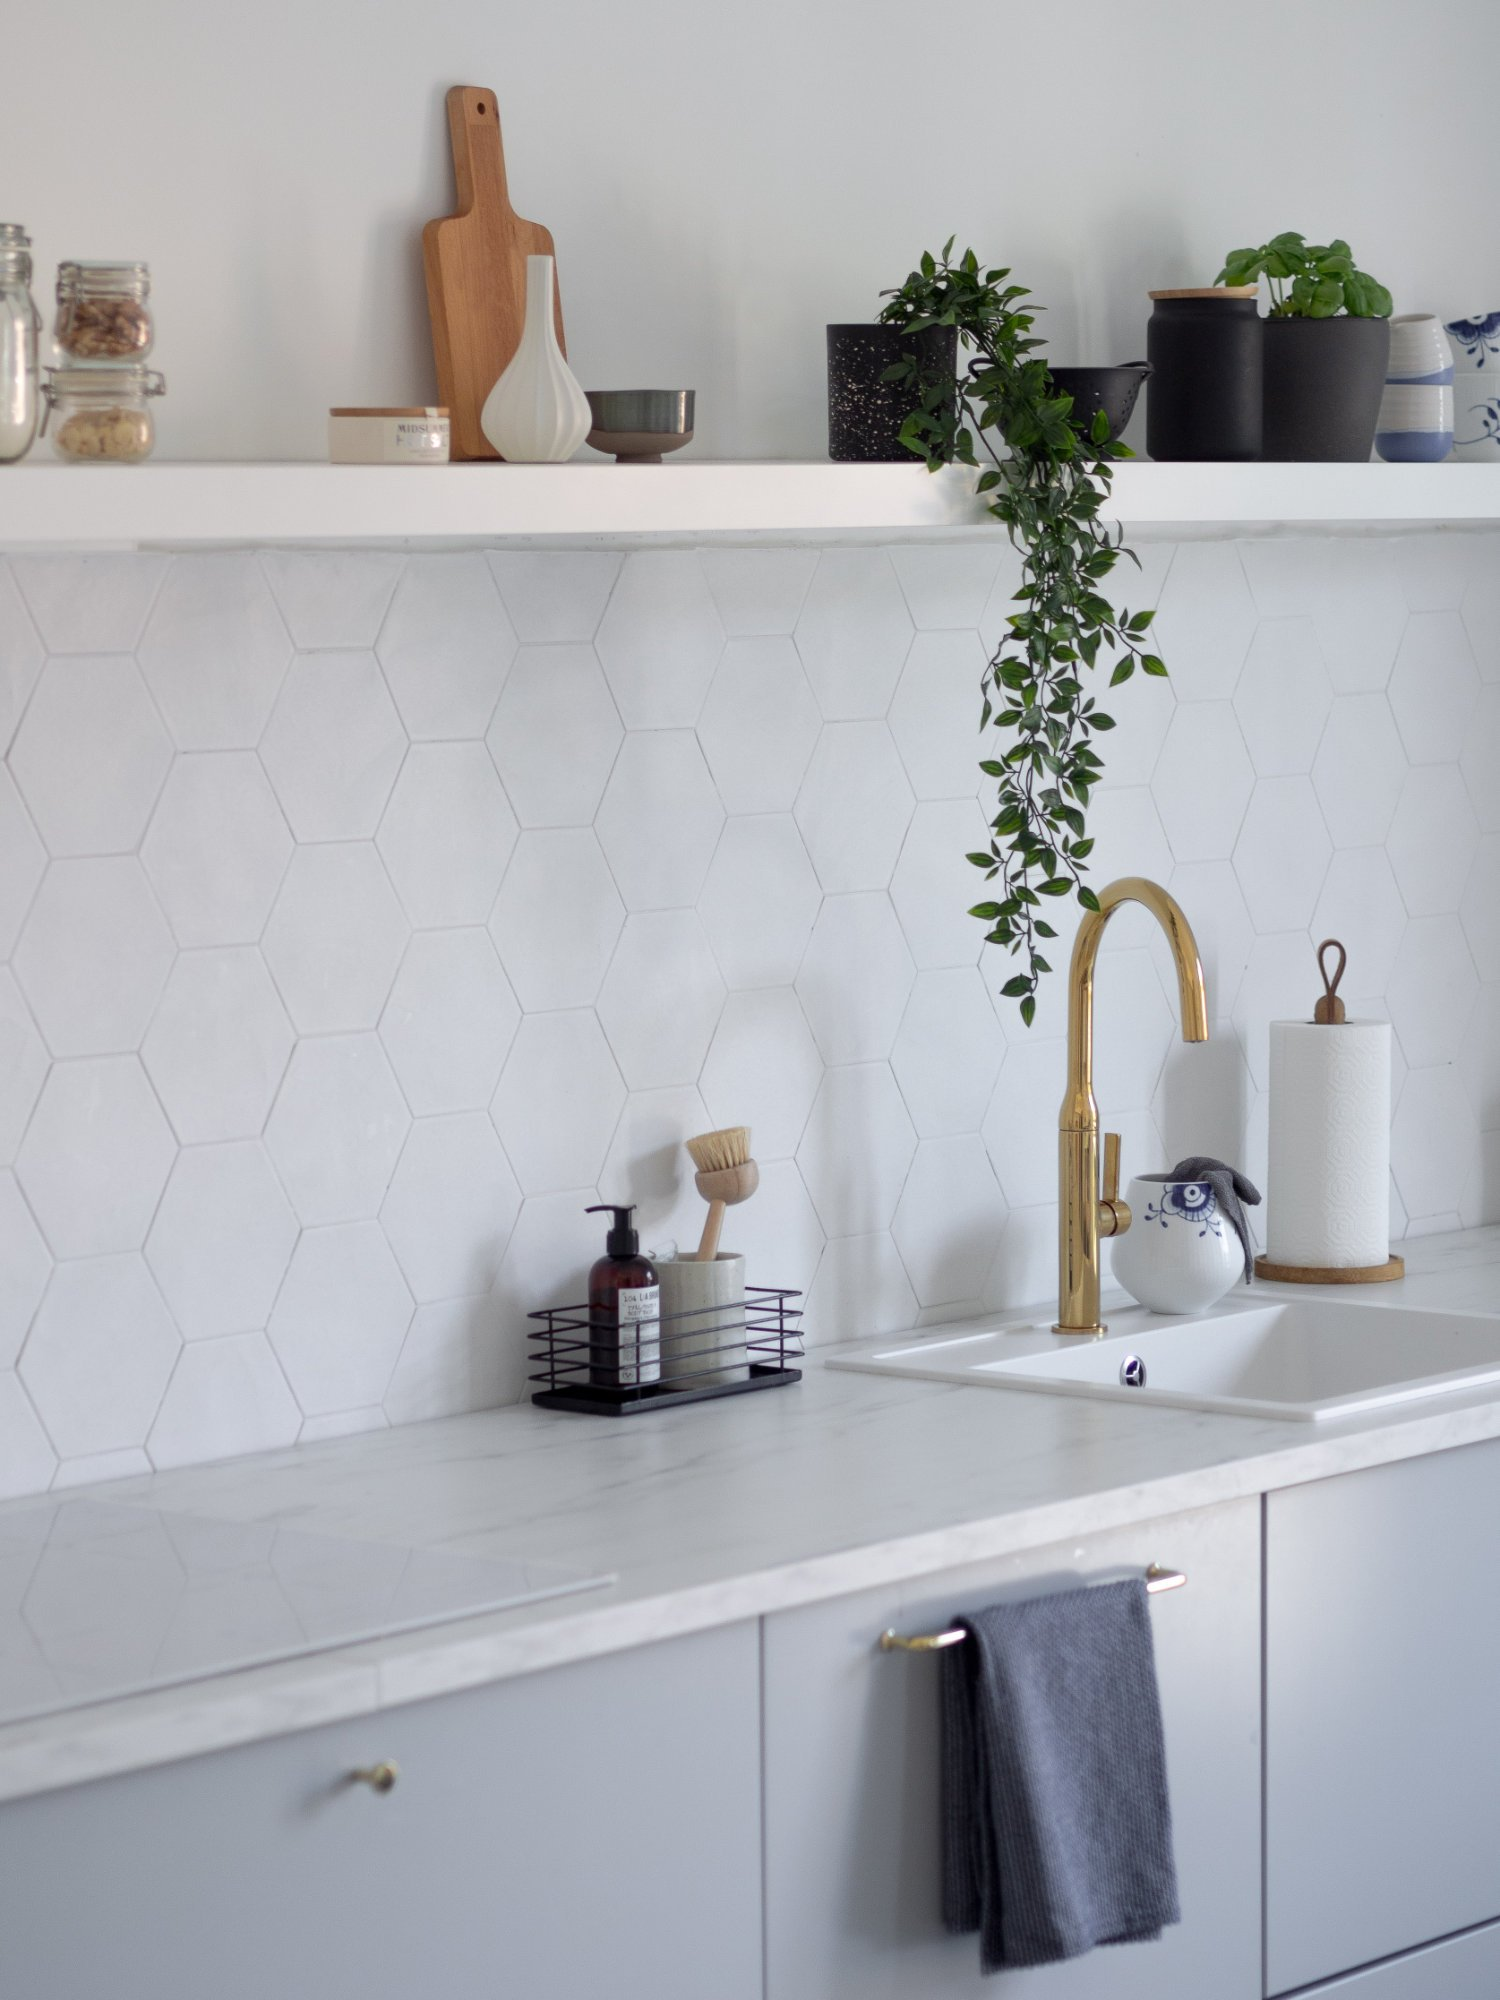 That Scandinavian Feeling Home Tour kitchen sink